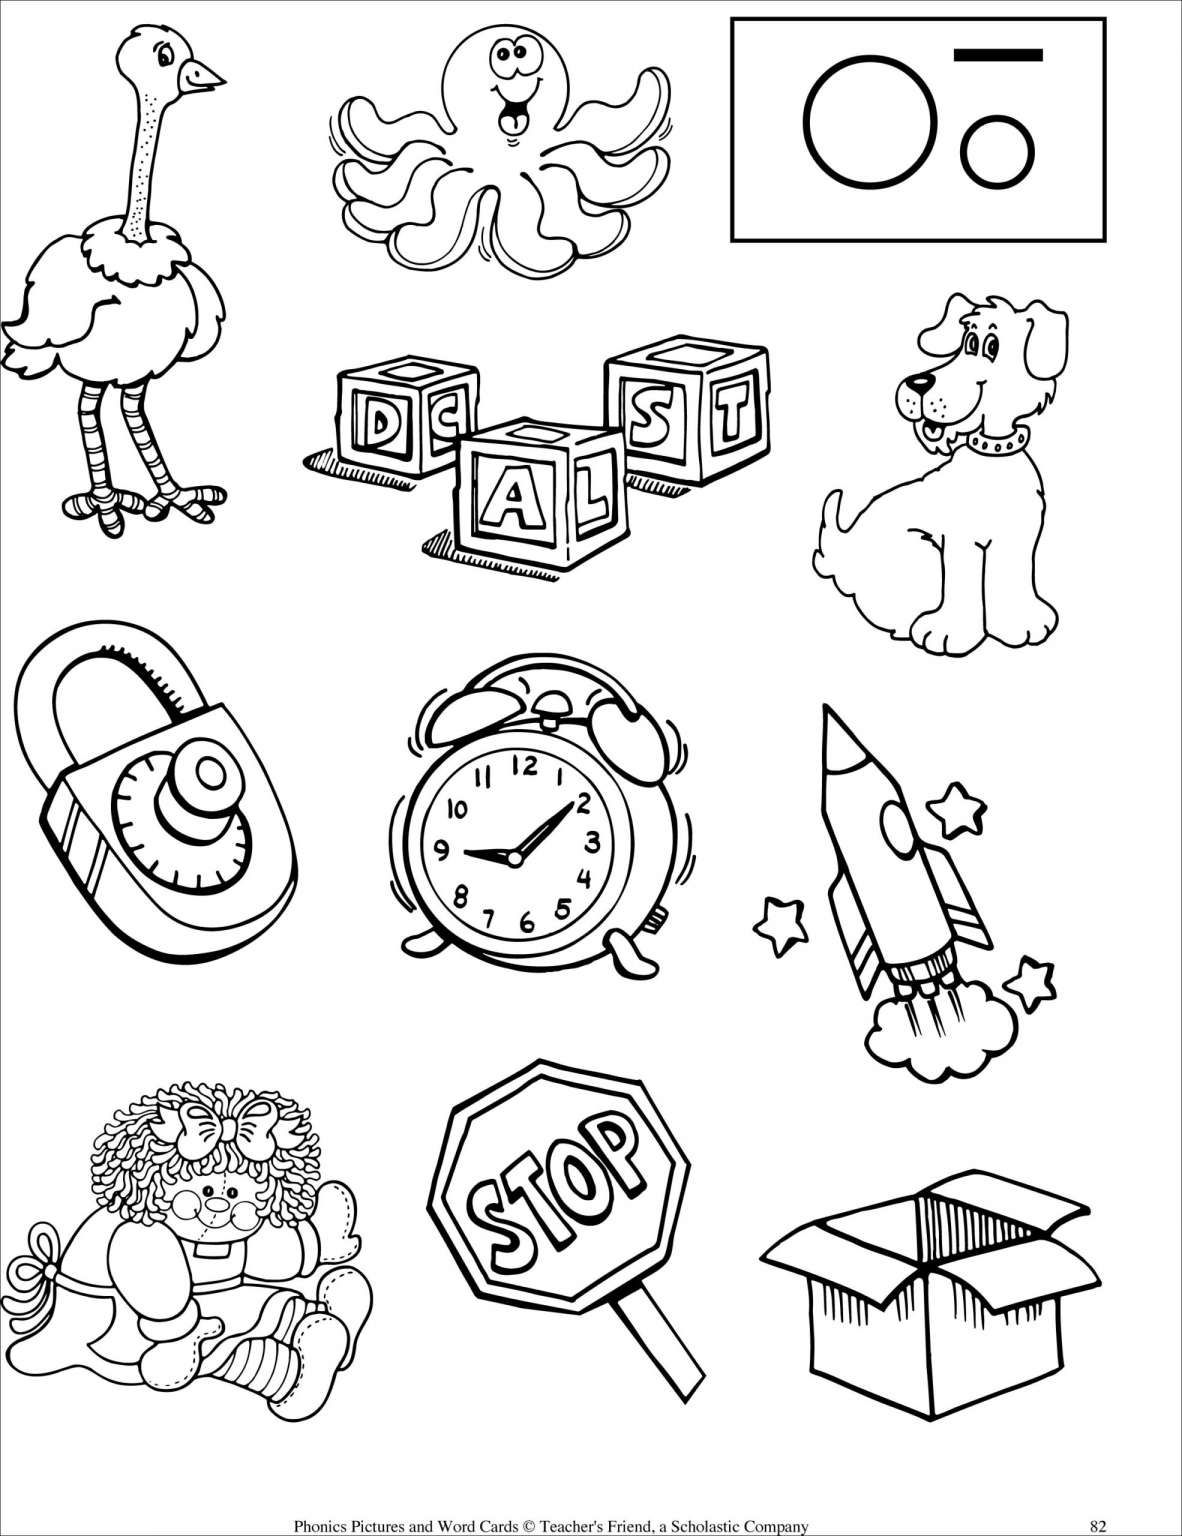 Preschool Worksheet With Short Words And Letter Worksheets